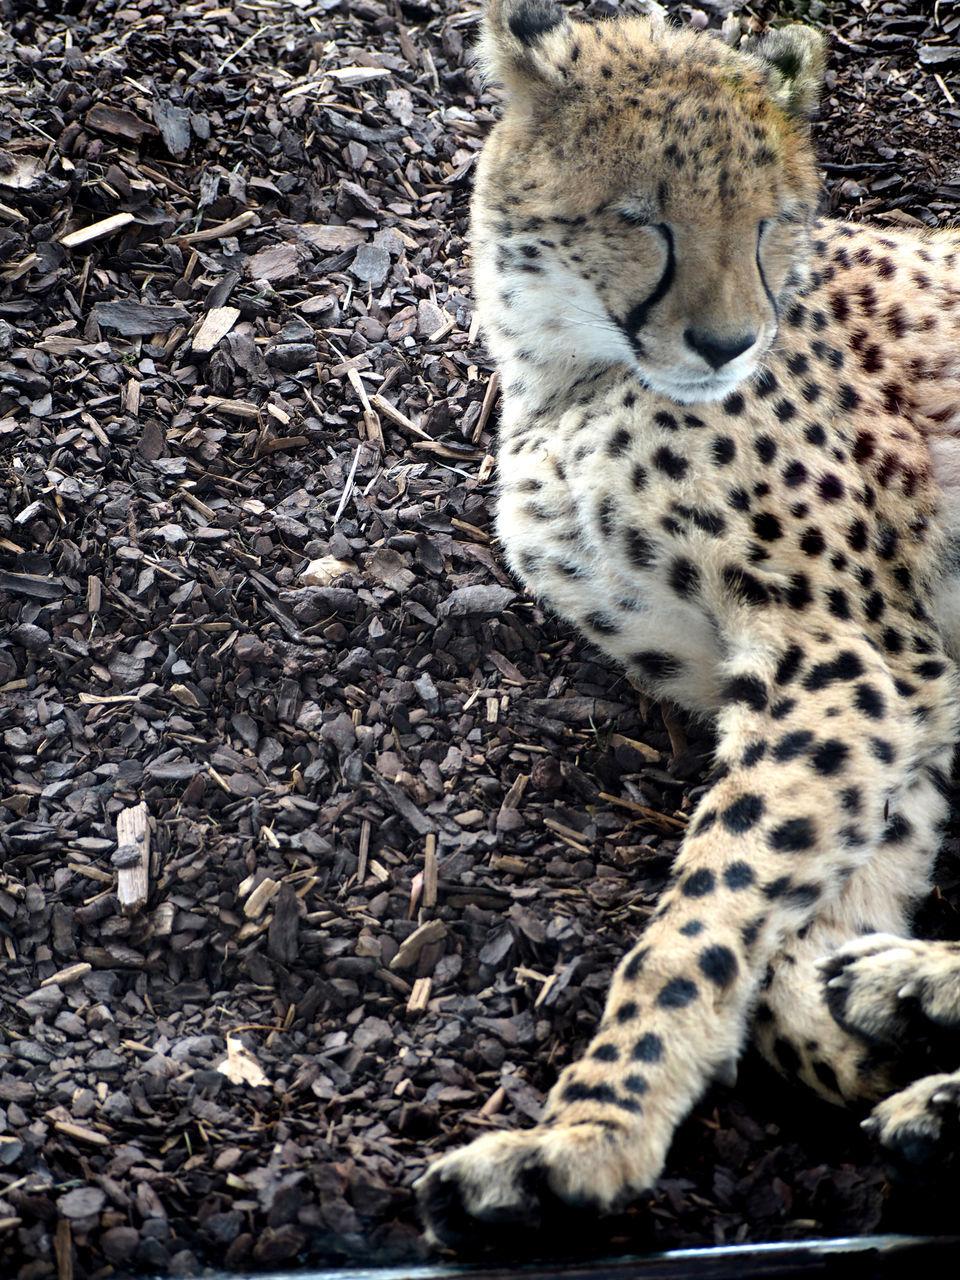 one animal, animal themes, animals in the wild, animal wildlife, day, mammal, feline, lying down, no people, outdoors, safari animals, leopard, nature, cheetah, close-up